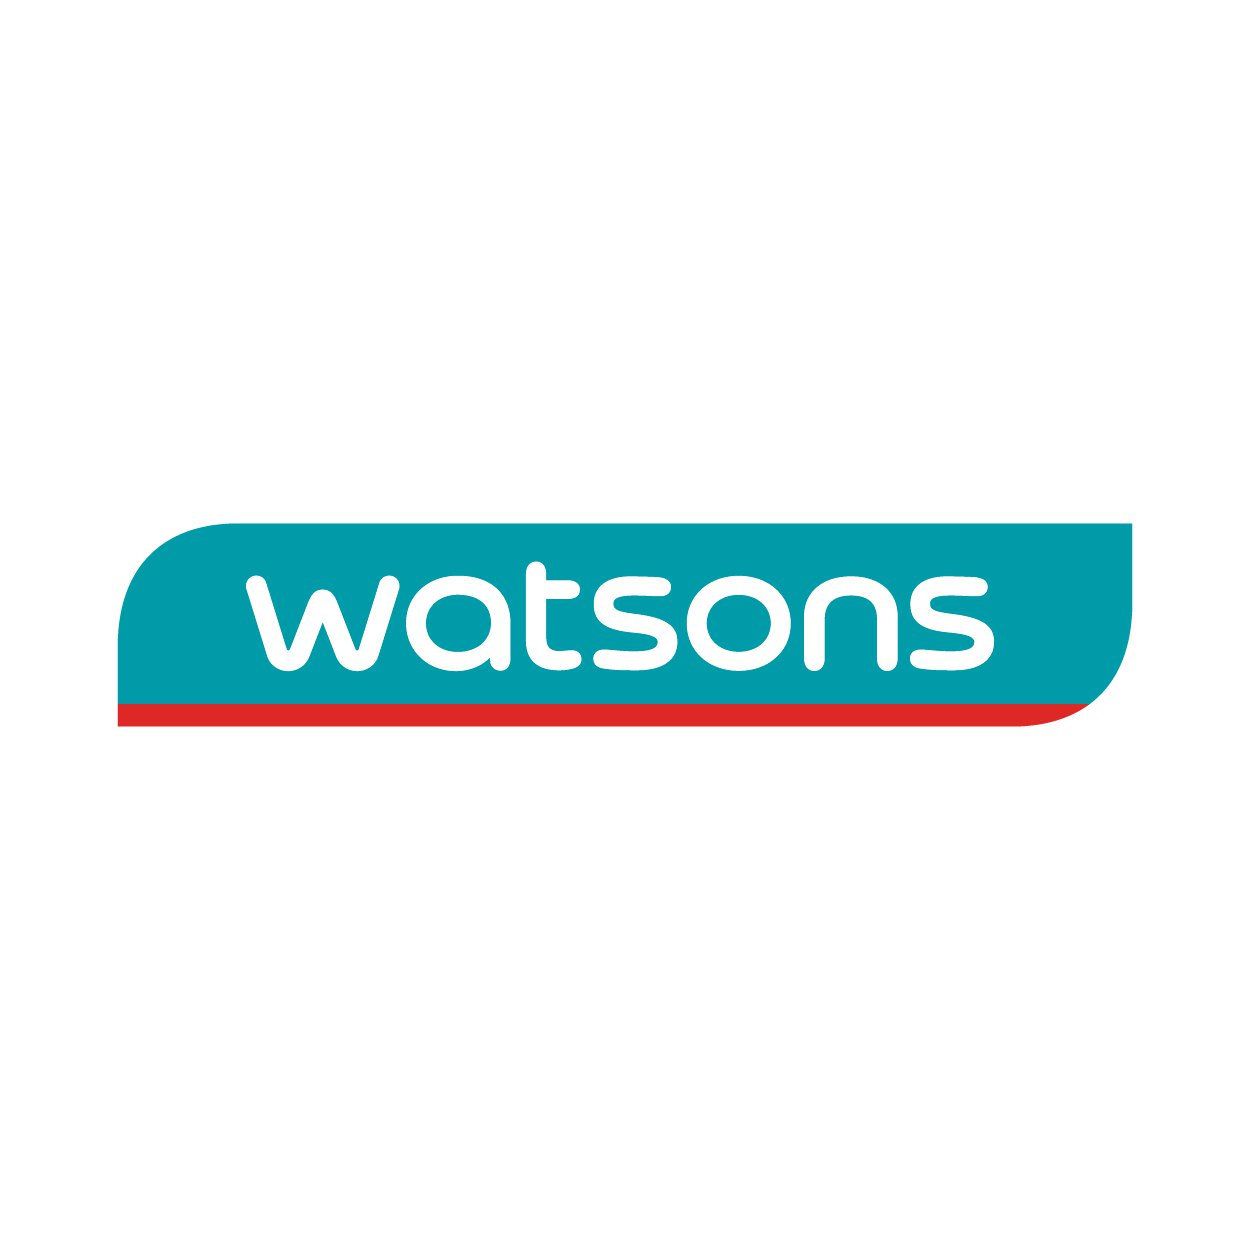 watsons-logo.jpg